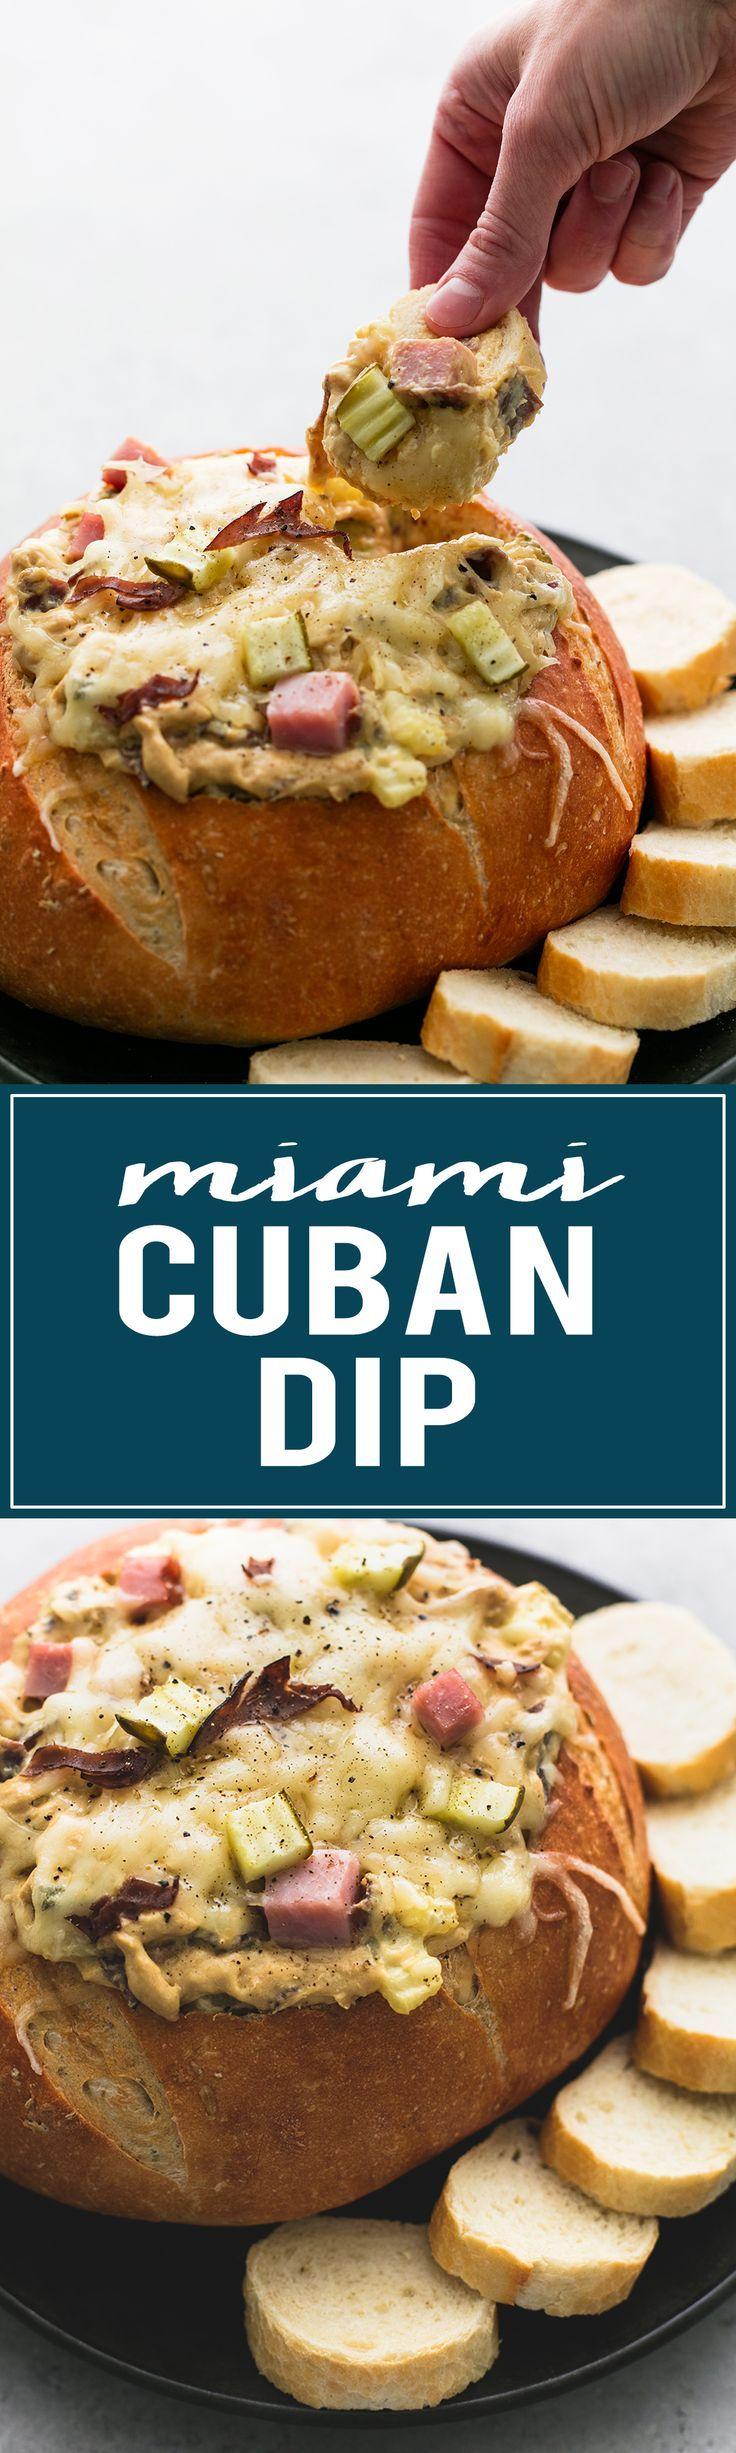 Miami Cuban Dip - a cheesy, dippable twist on the famous Cuban sandwich!   http://lecremedelacrumb.com